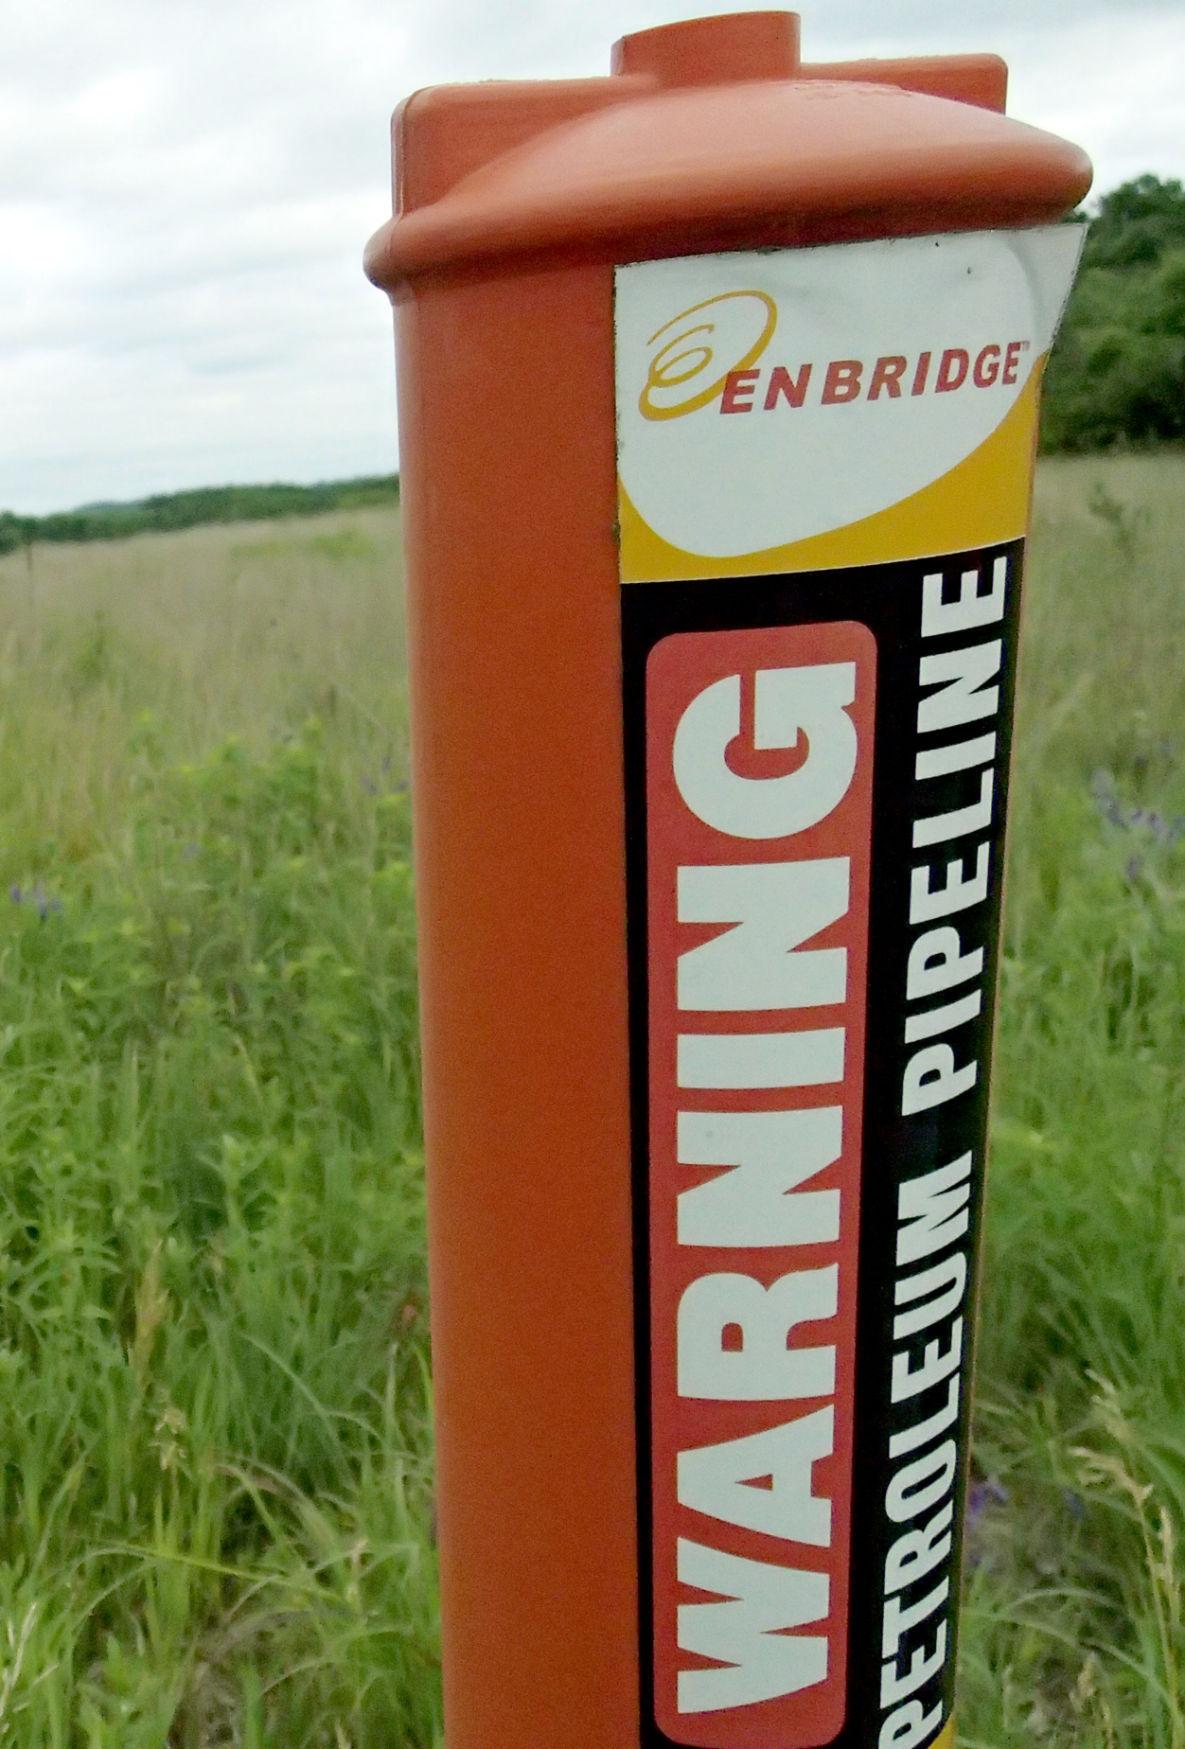 Pipeline warning